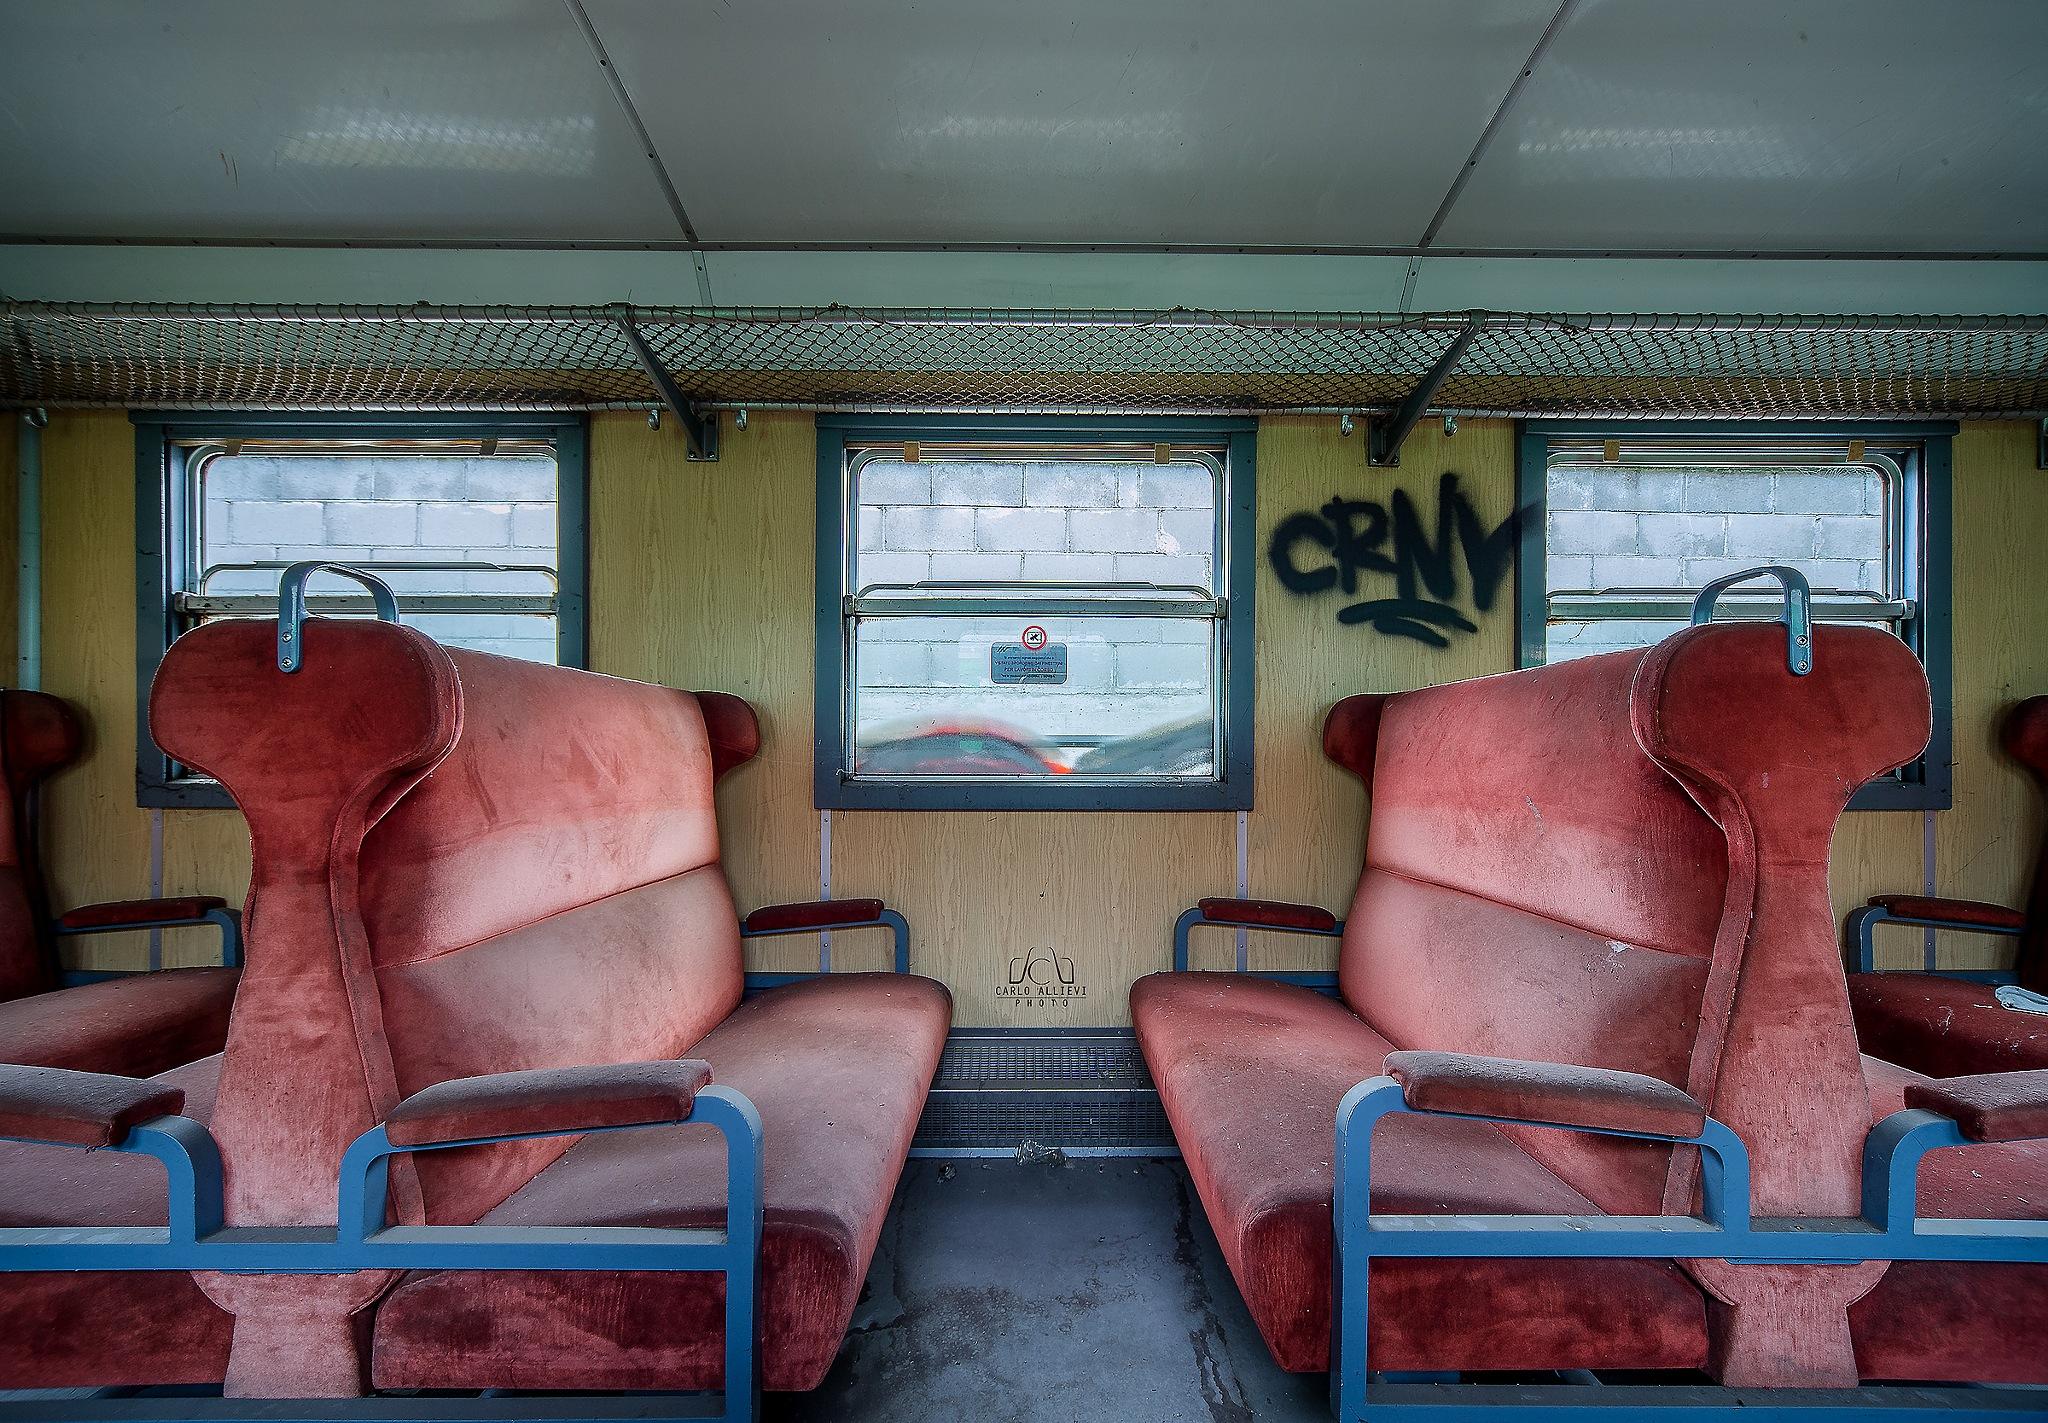 Free seats on board by Carlo Allievi